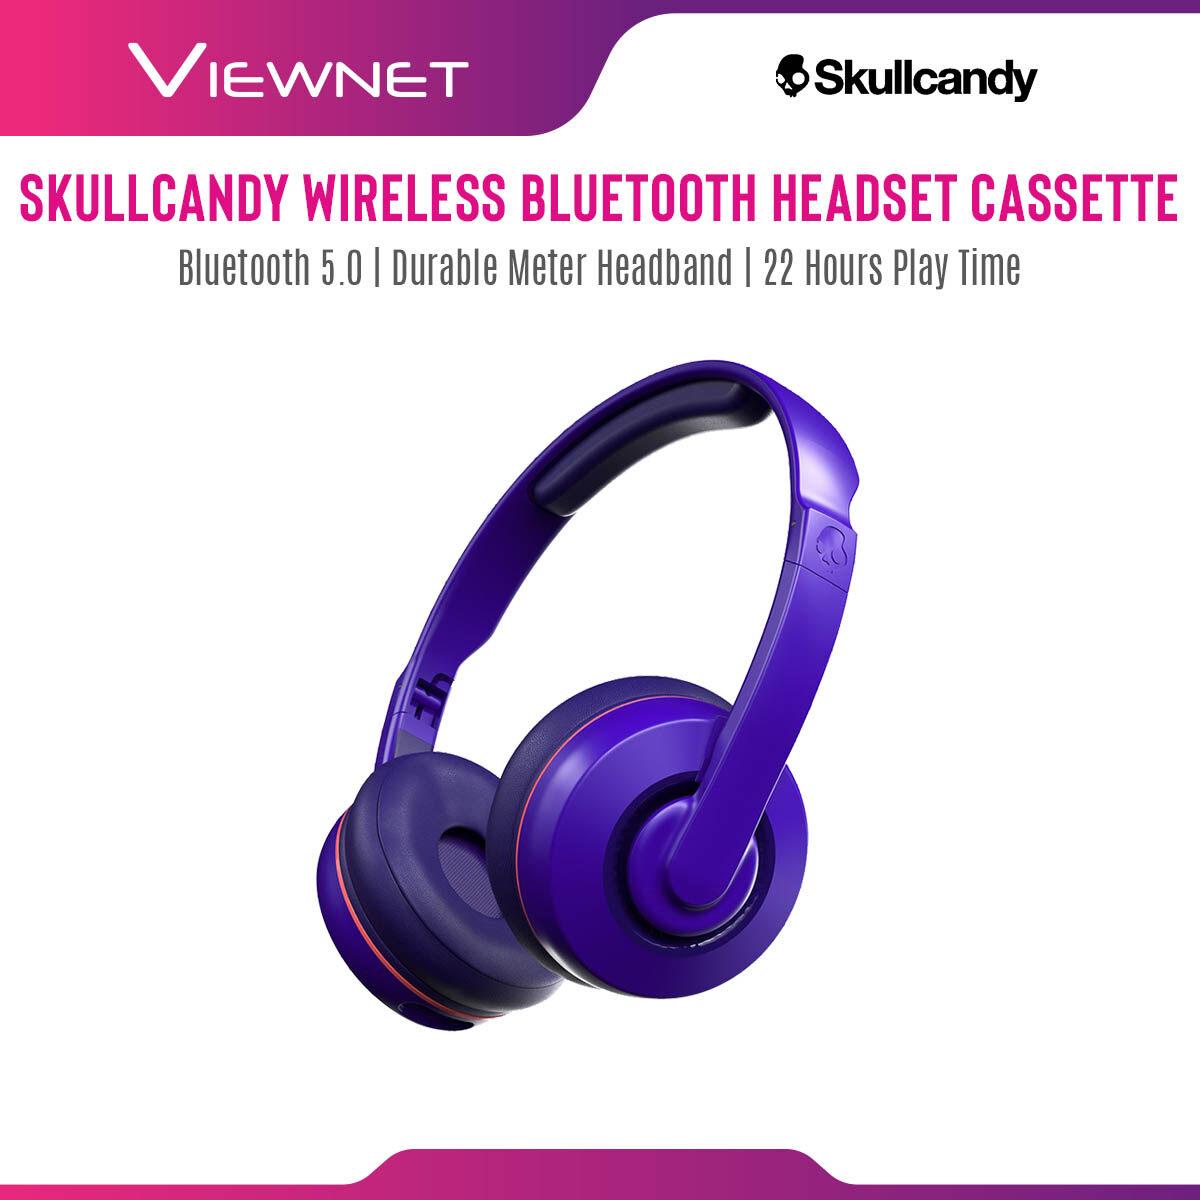 Skullcandy Cassette Wireless Bluetooth On-Ear Headphones